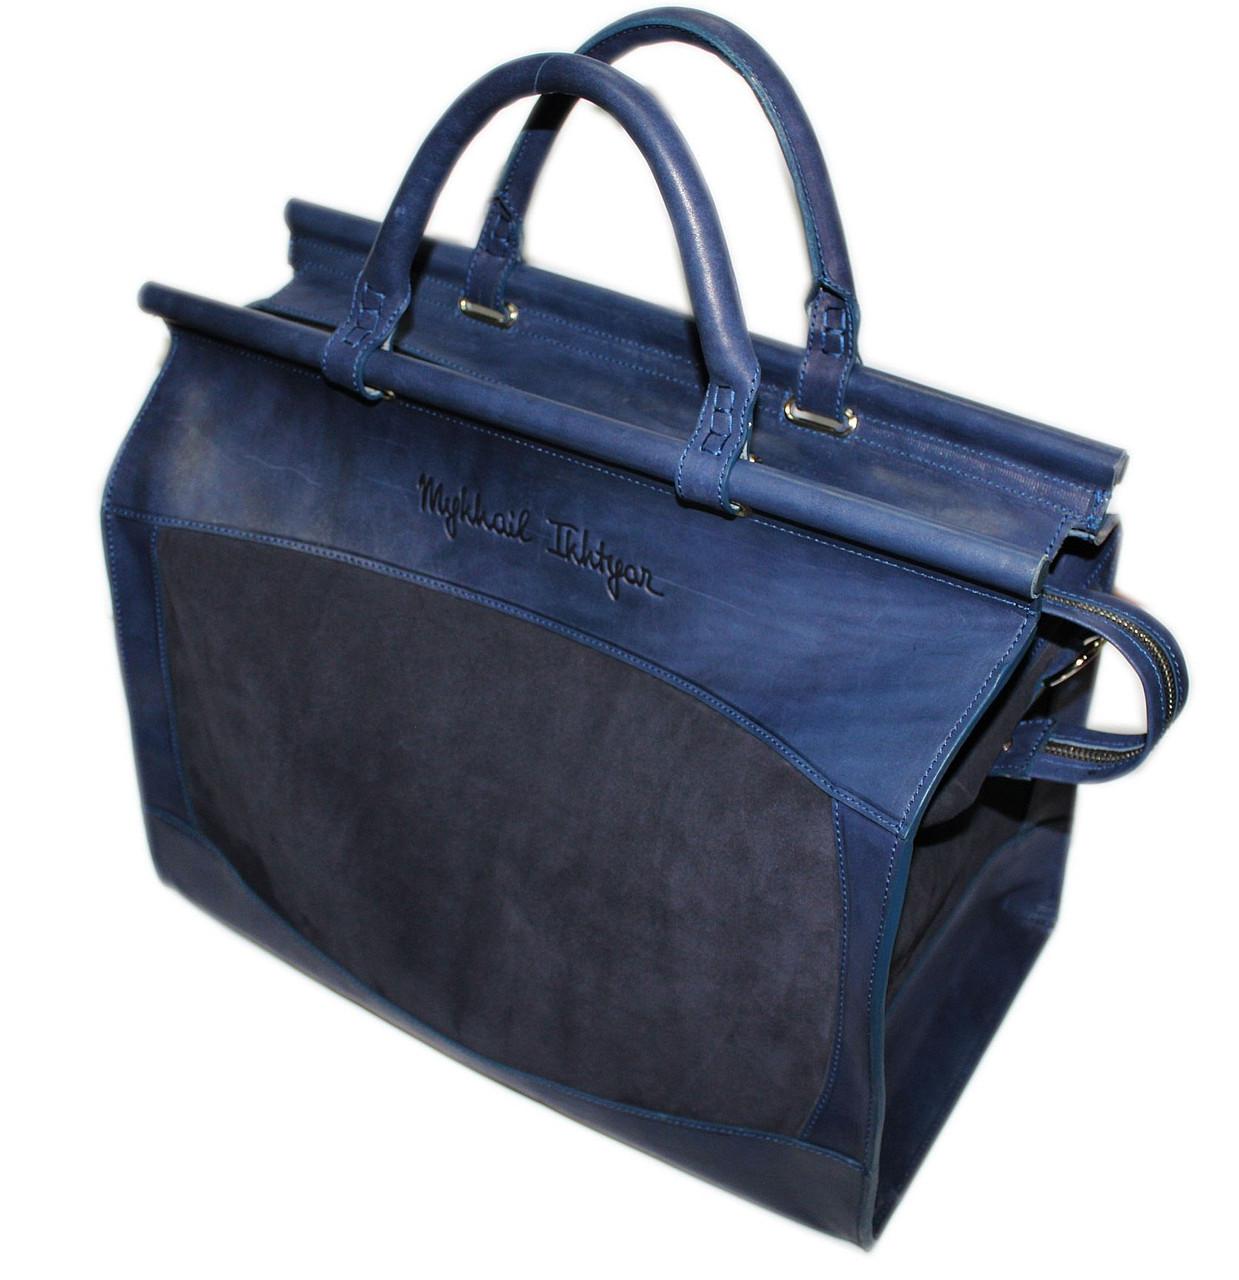 Стильный саквояж мужской дорожный кожаный 25 л. Mykhail Ikhtyar ДхГхВ: 44х18х40 см. синий